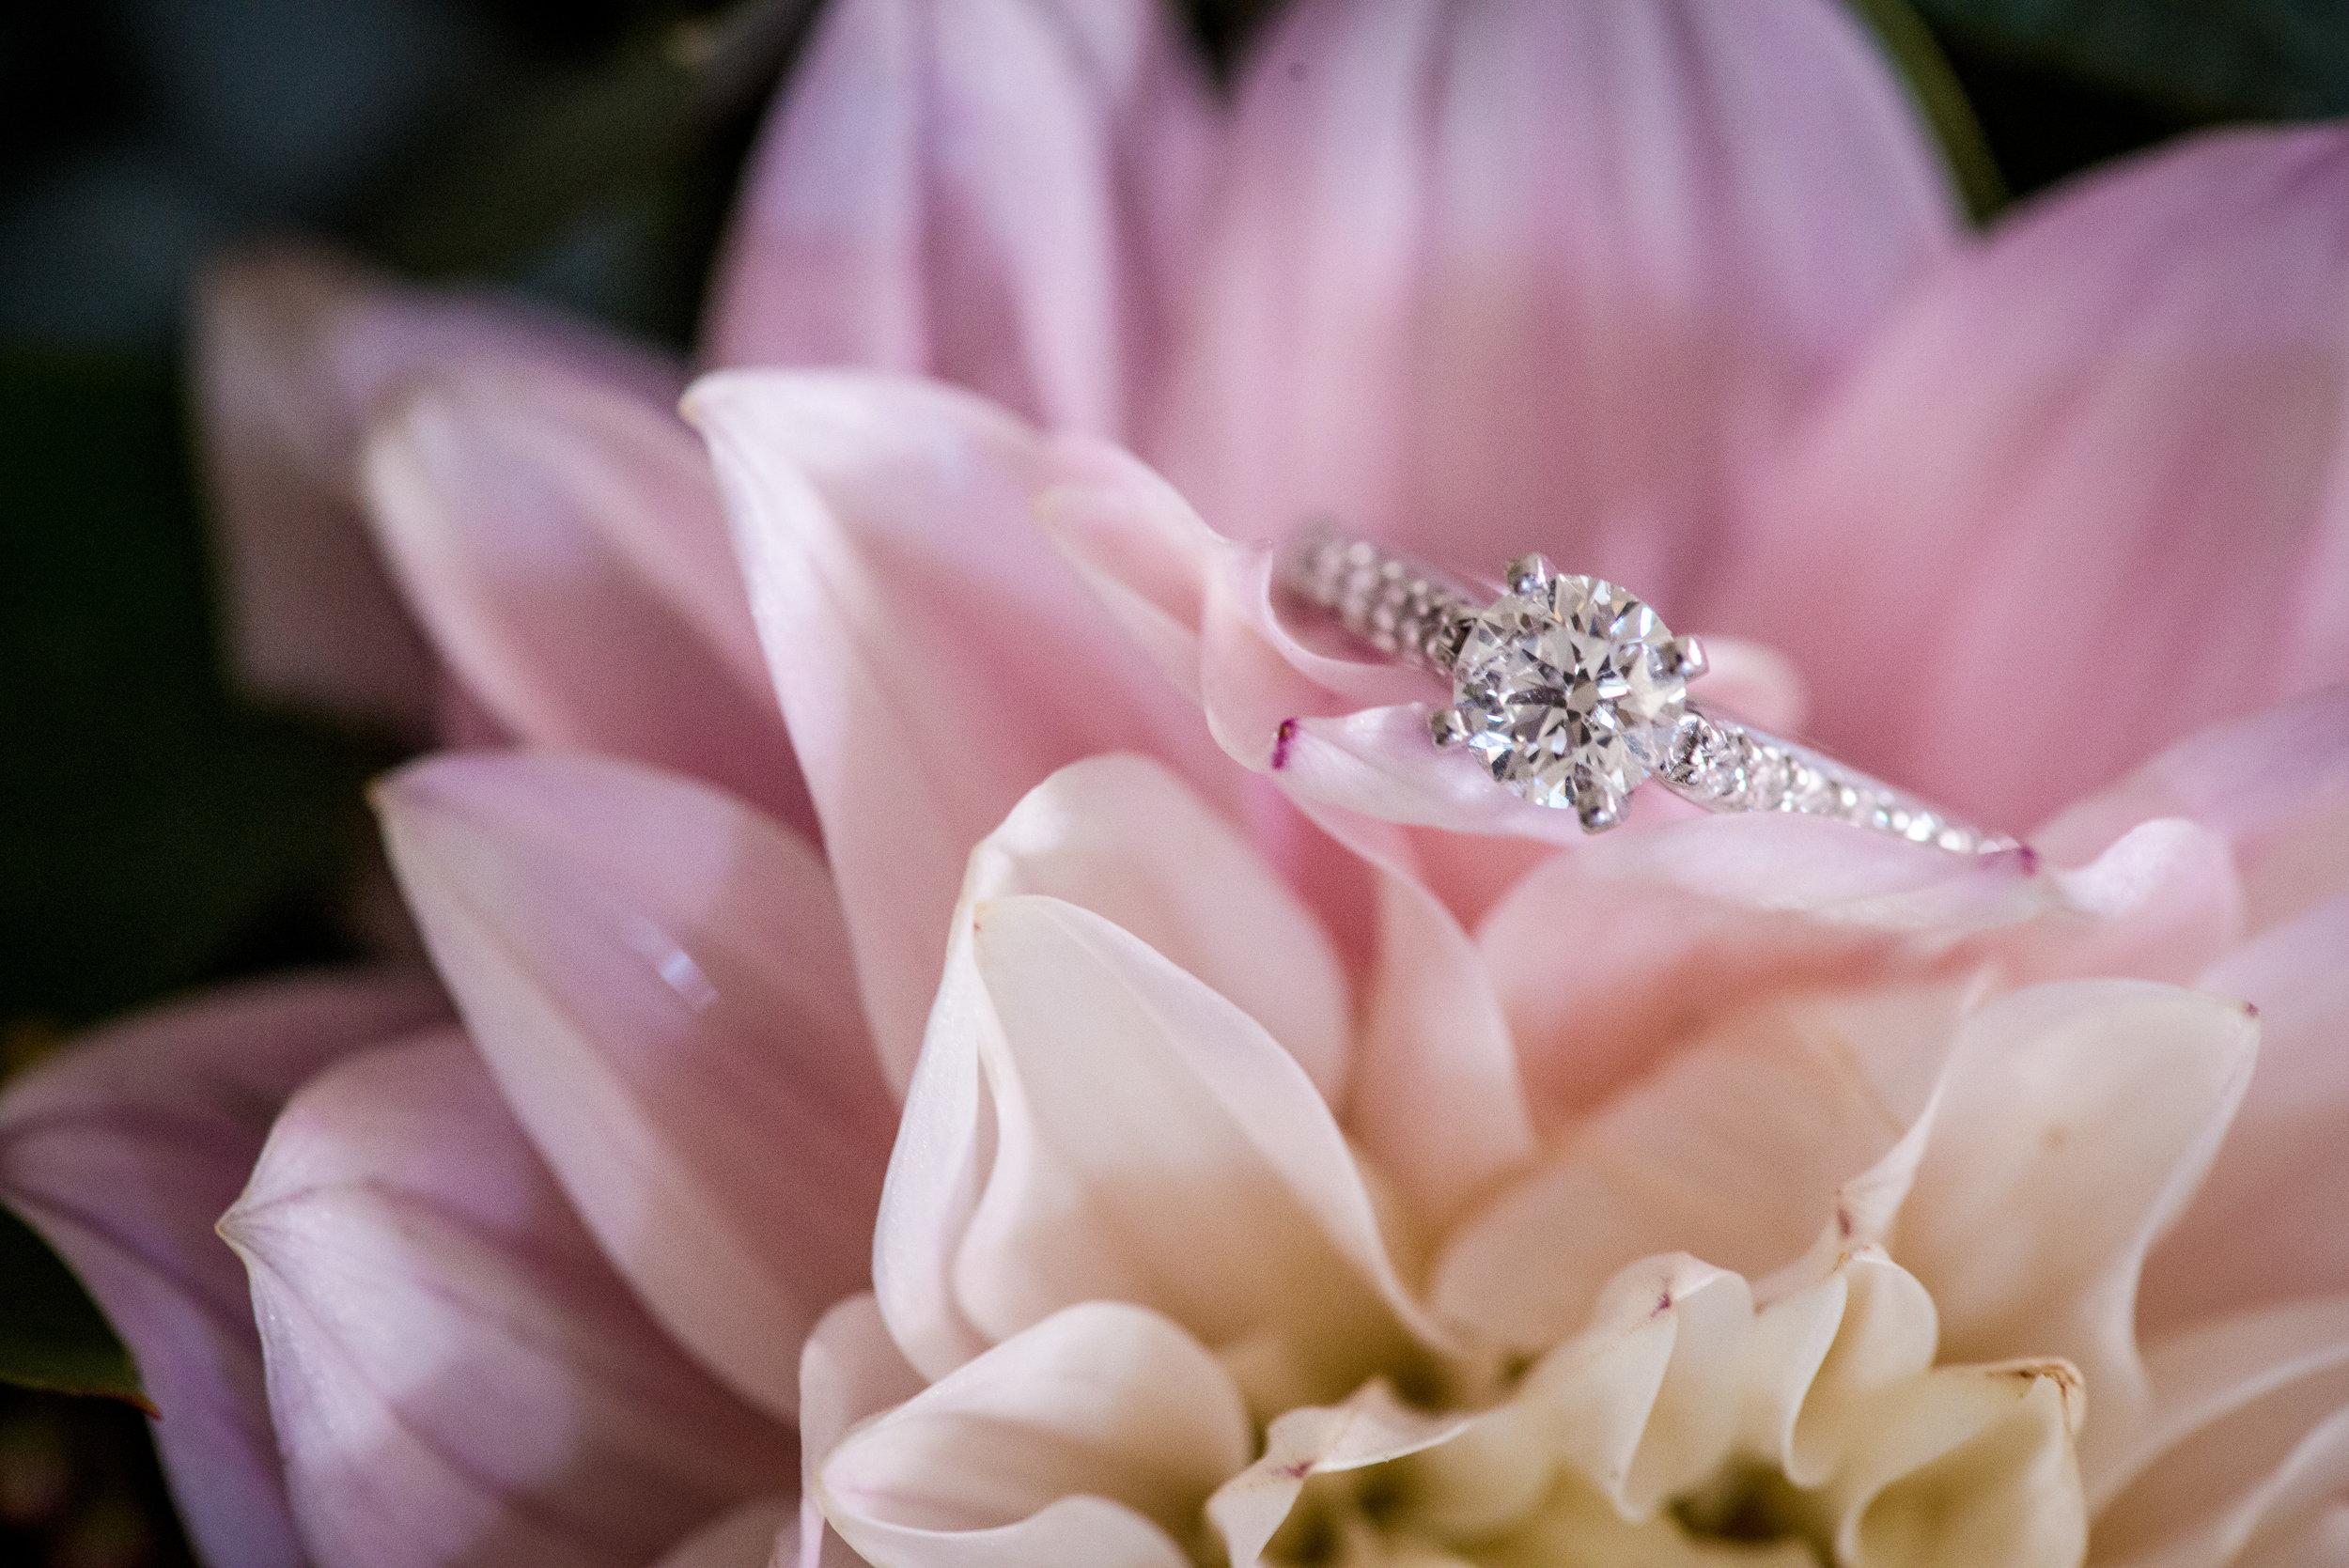 Dahlia_Wedding_Rings_Vizcaya_Sacramento_Violette_Fleurs.jpg